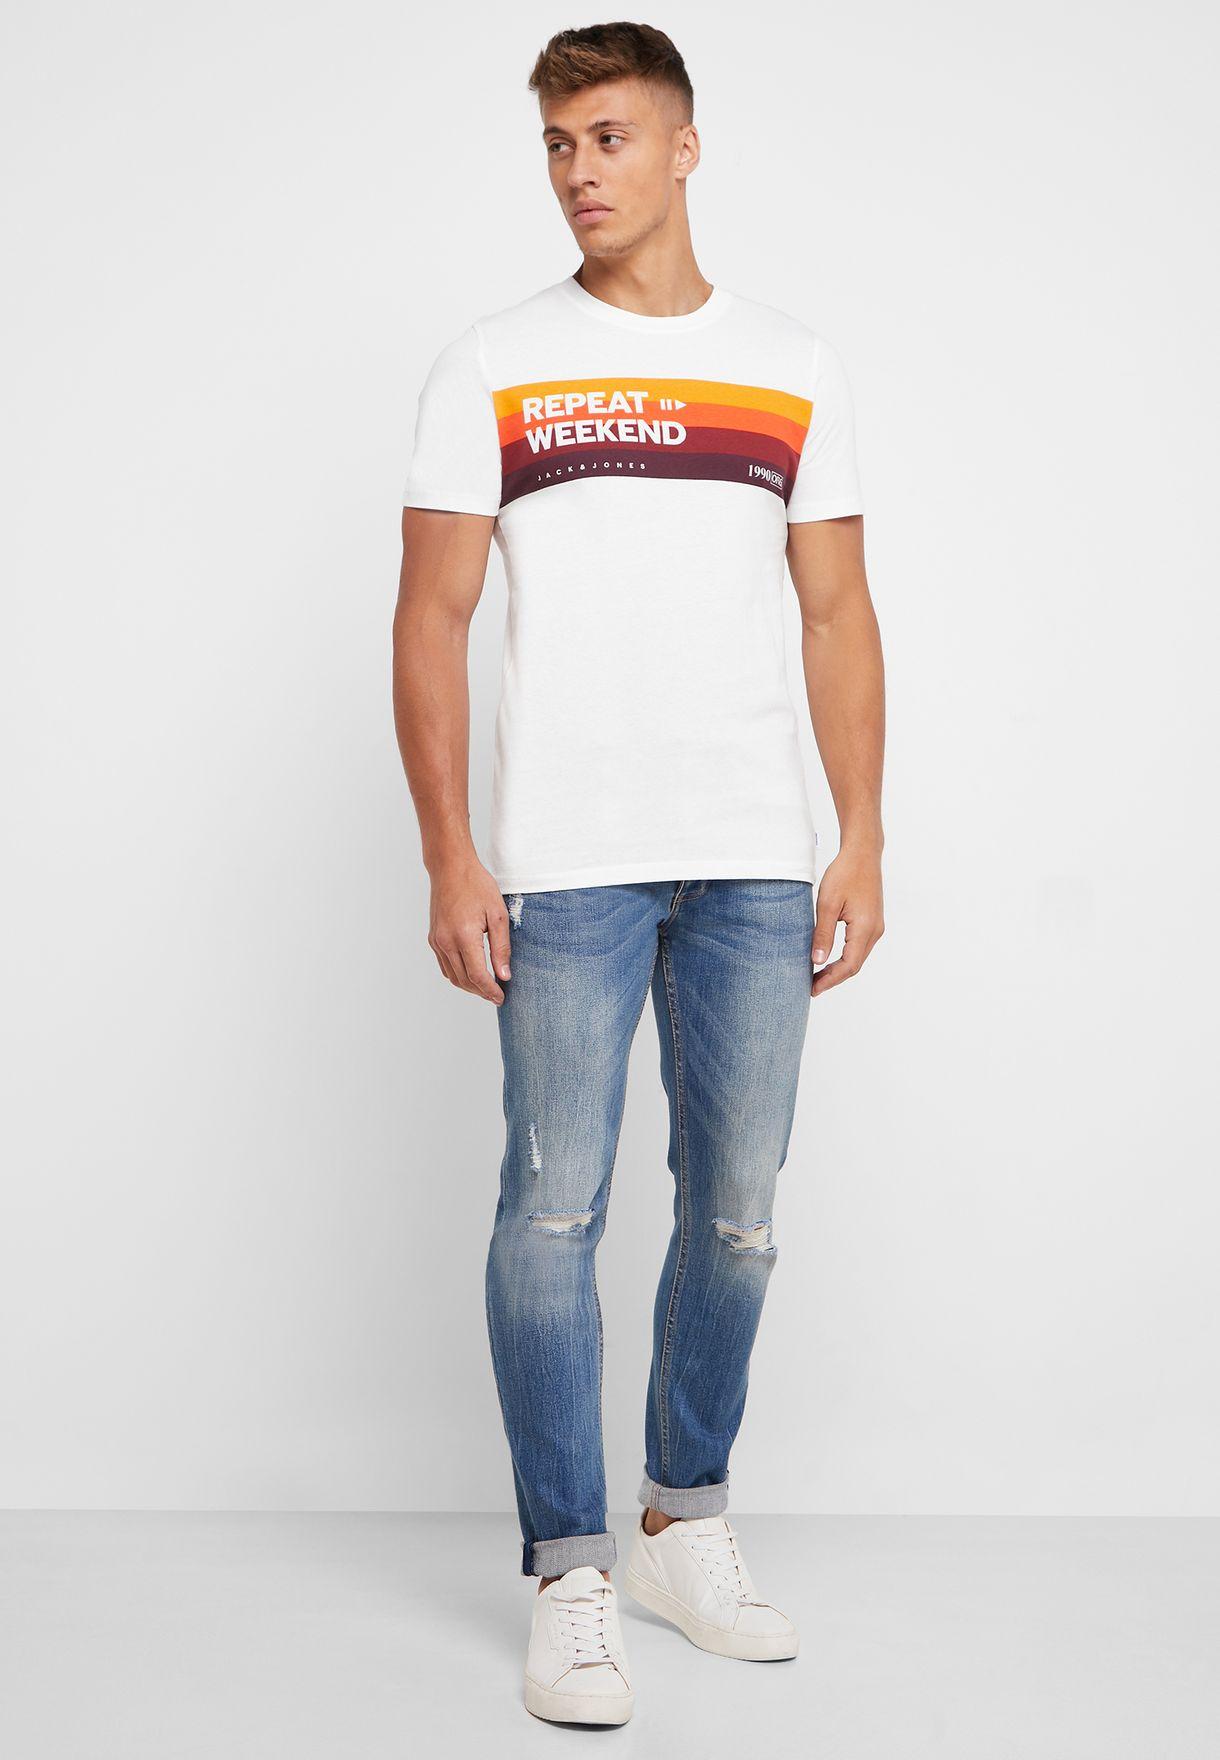 Repeat Weekend Slim Fit Crew Neck T-Shirt